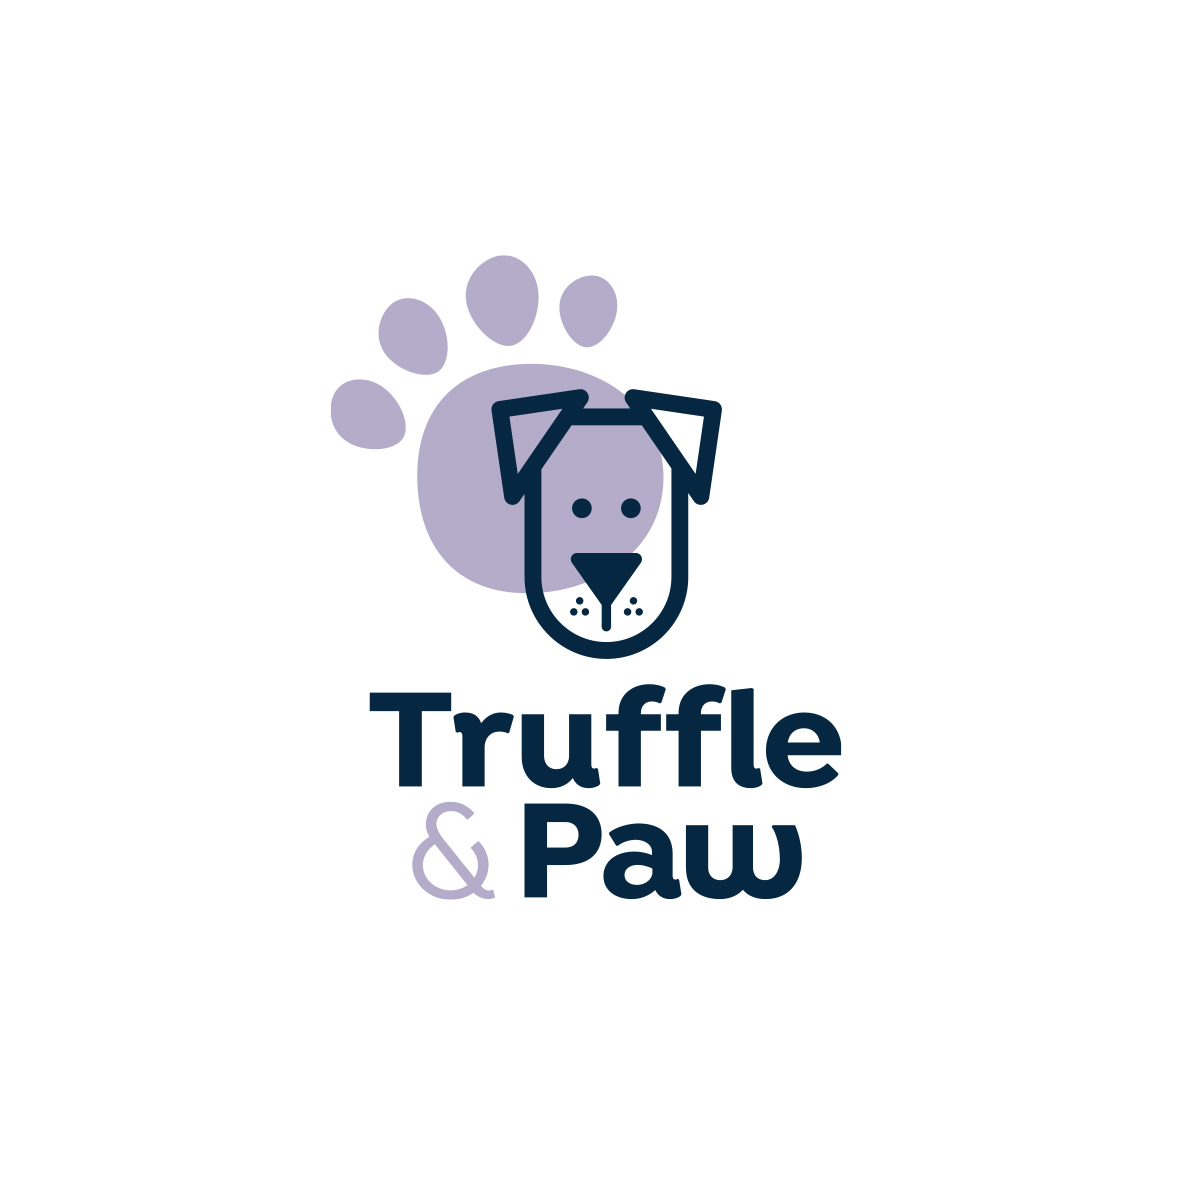 Various-Logos_Truffle